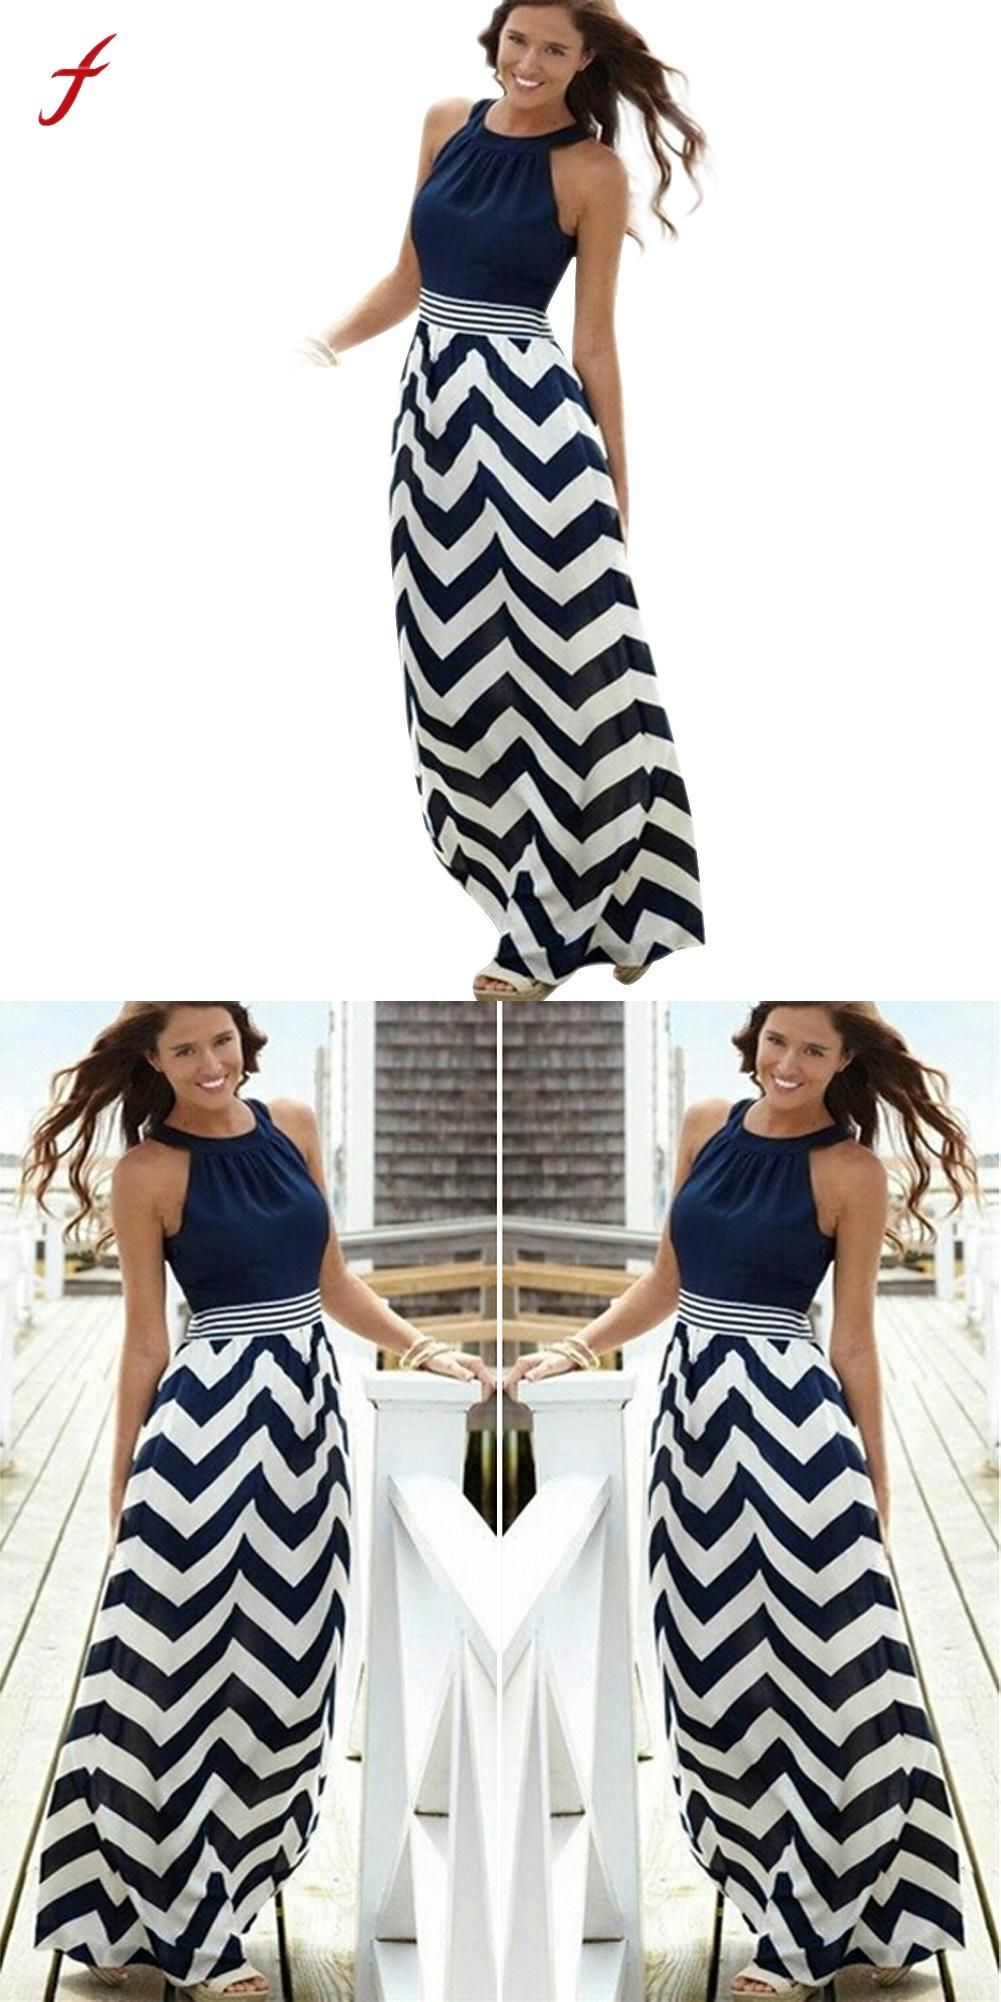 4f1125e4f1 Women New Sexy Summer Long Maxi BOHO Evening Party Beach Dresses Sundress  Stripe O-Neck